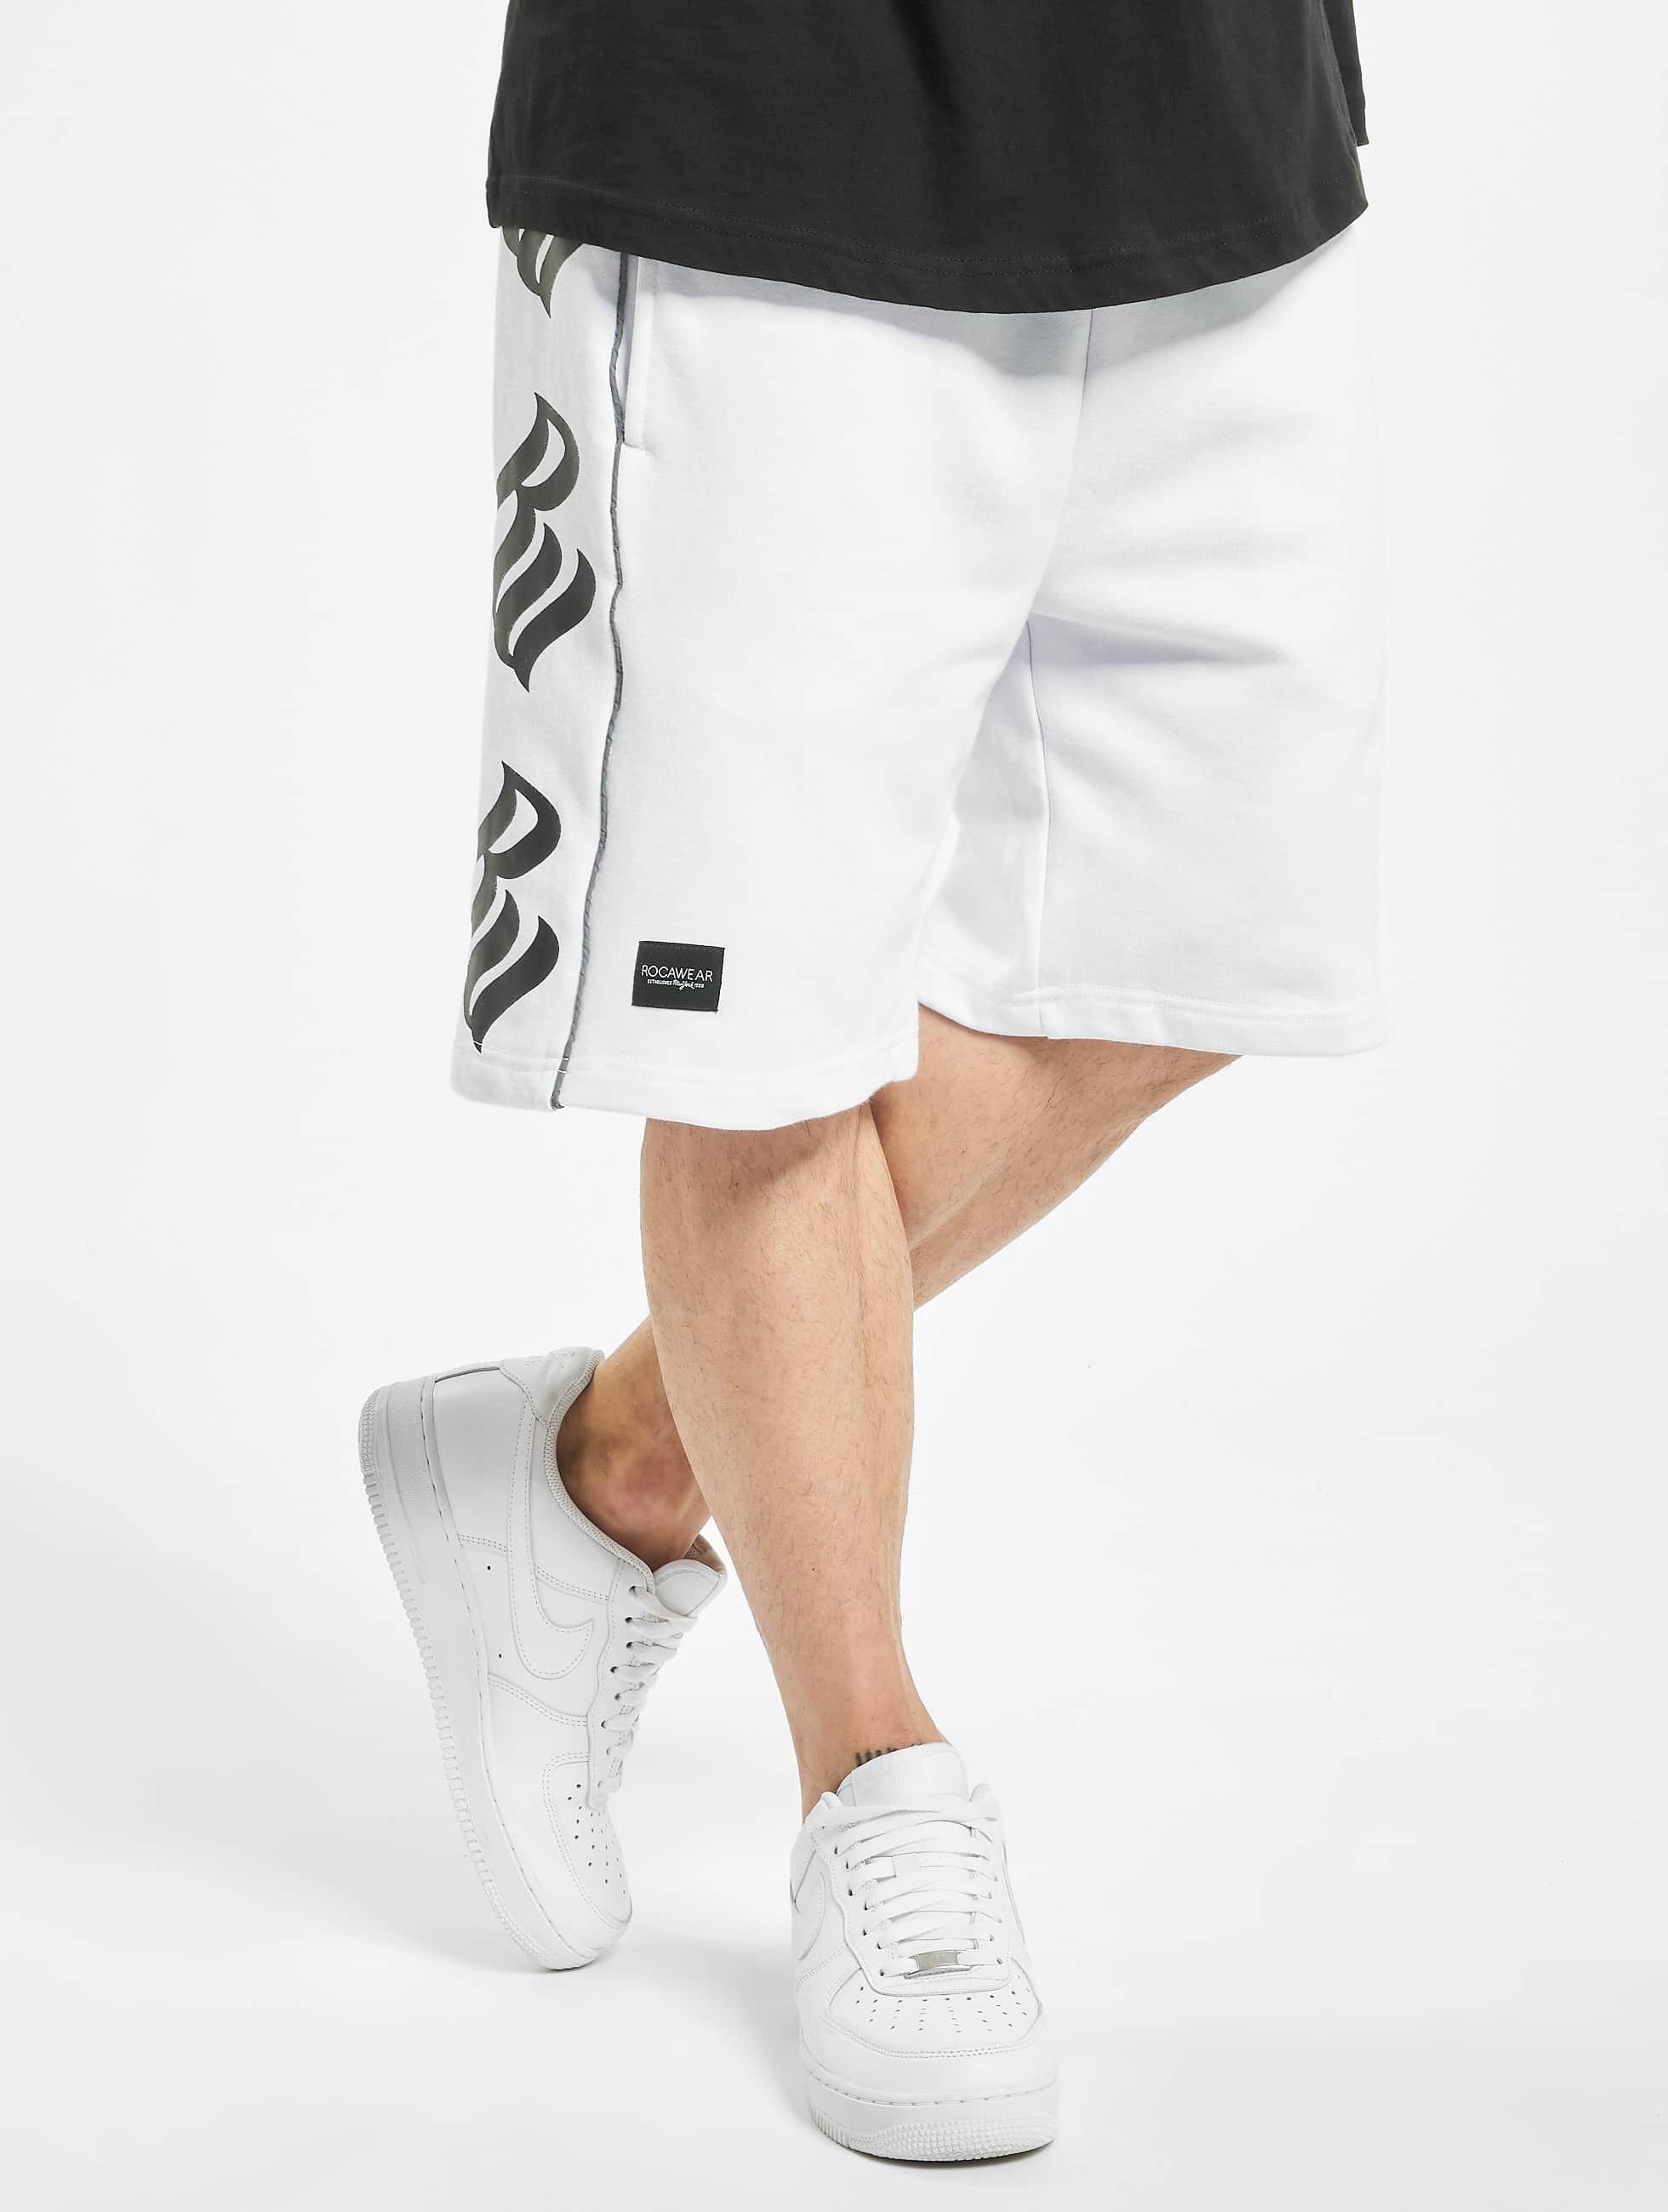 Rocawear / Short Hudson in white M